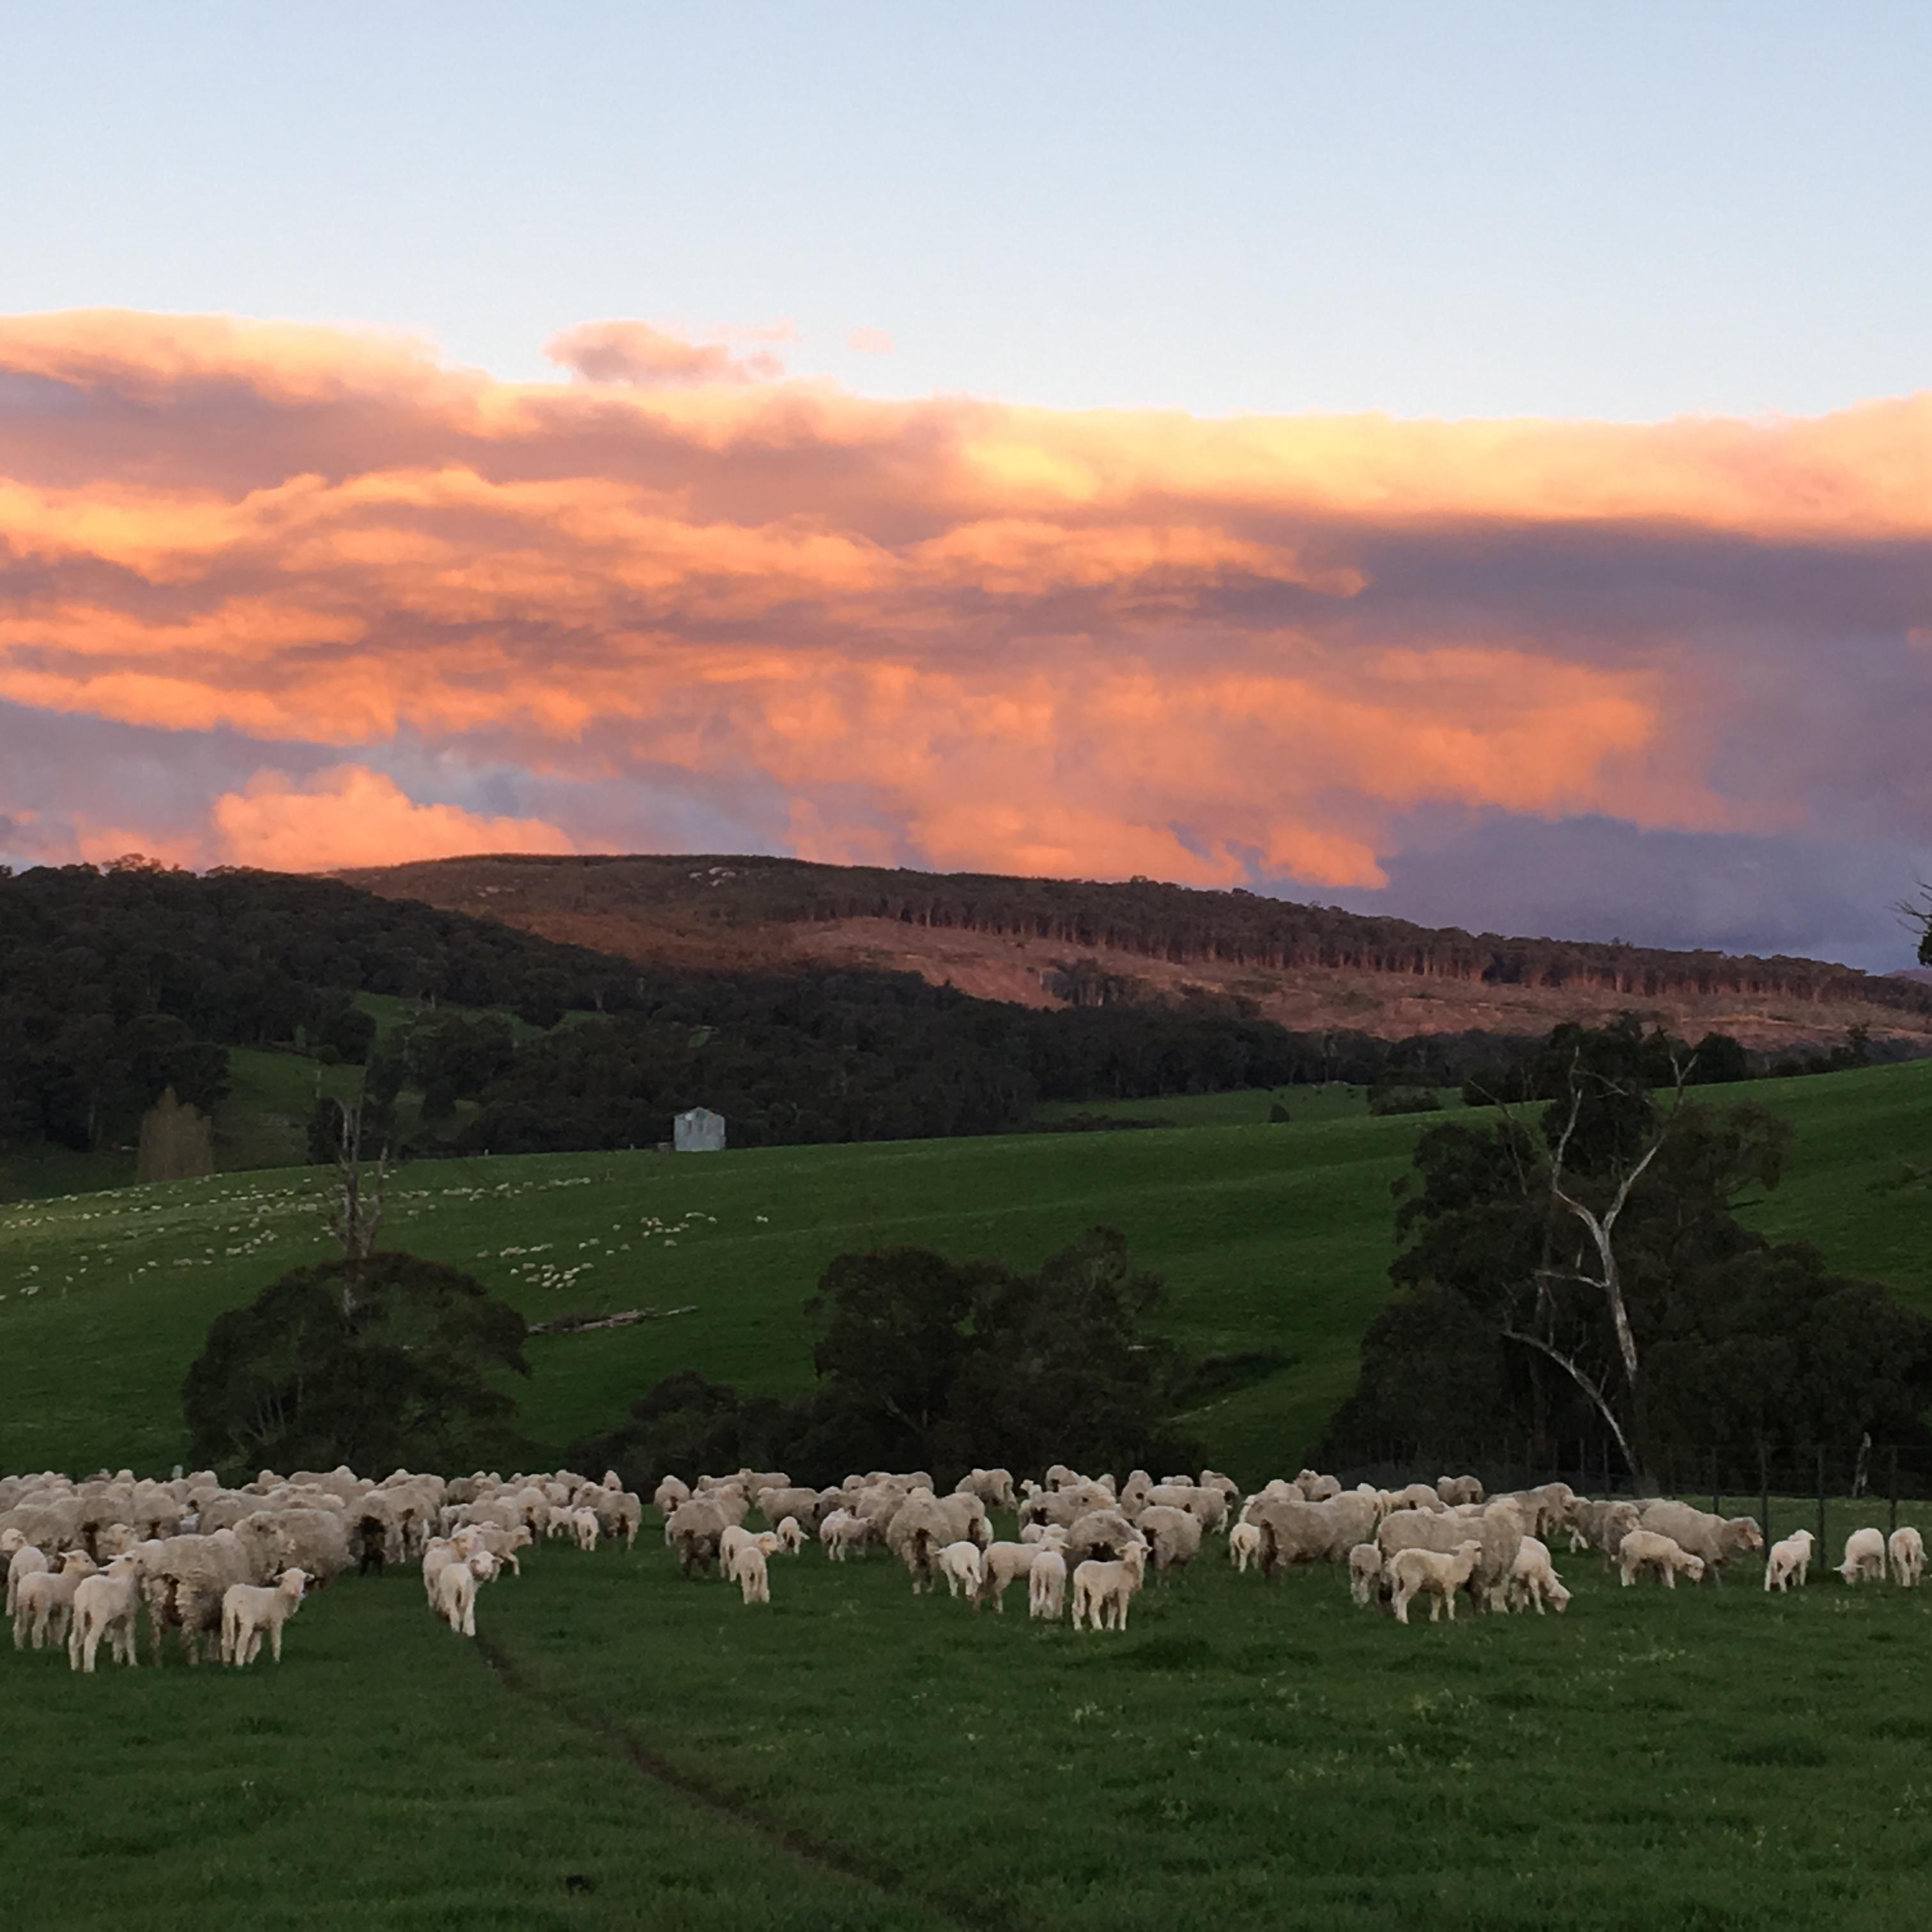 Sunset over Burbidge Farms